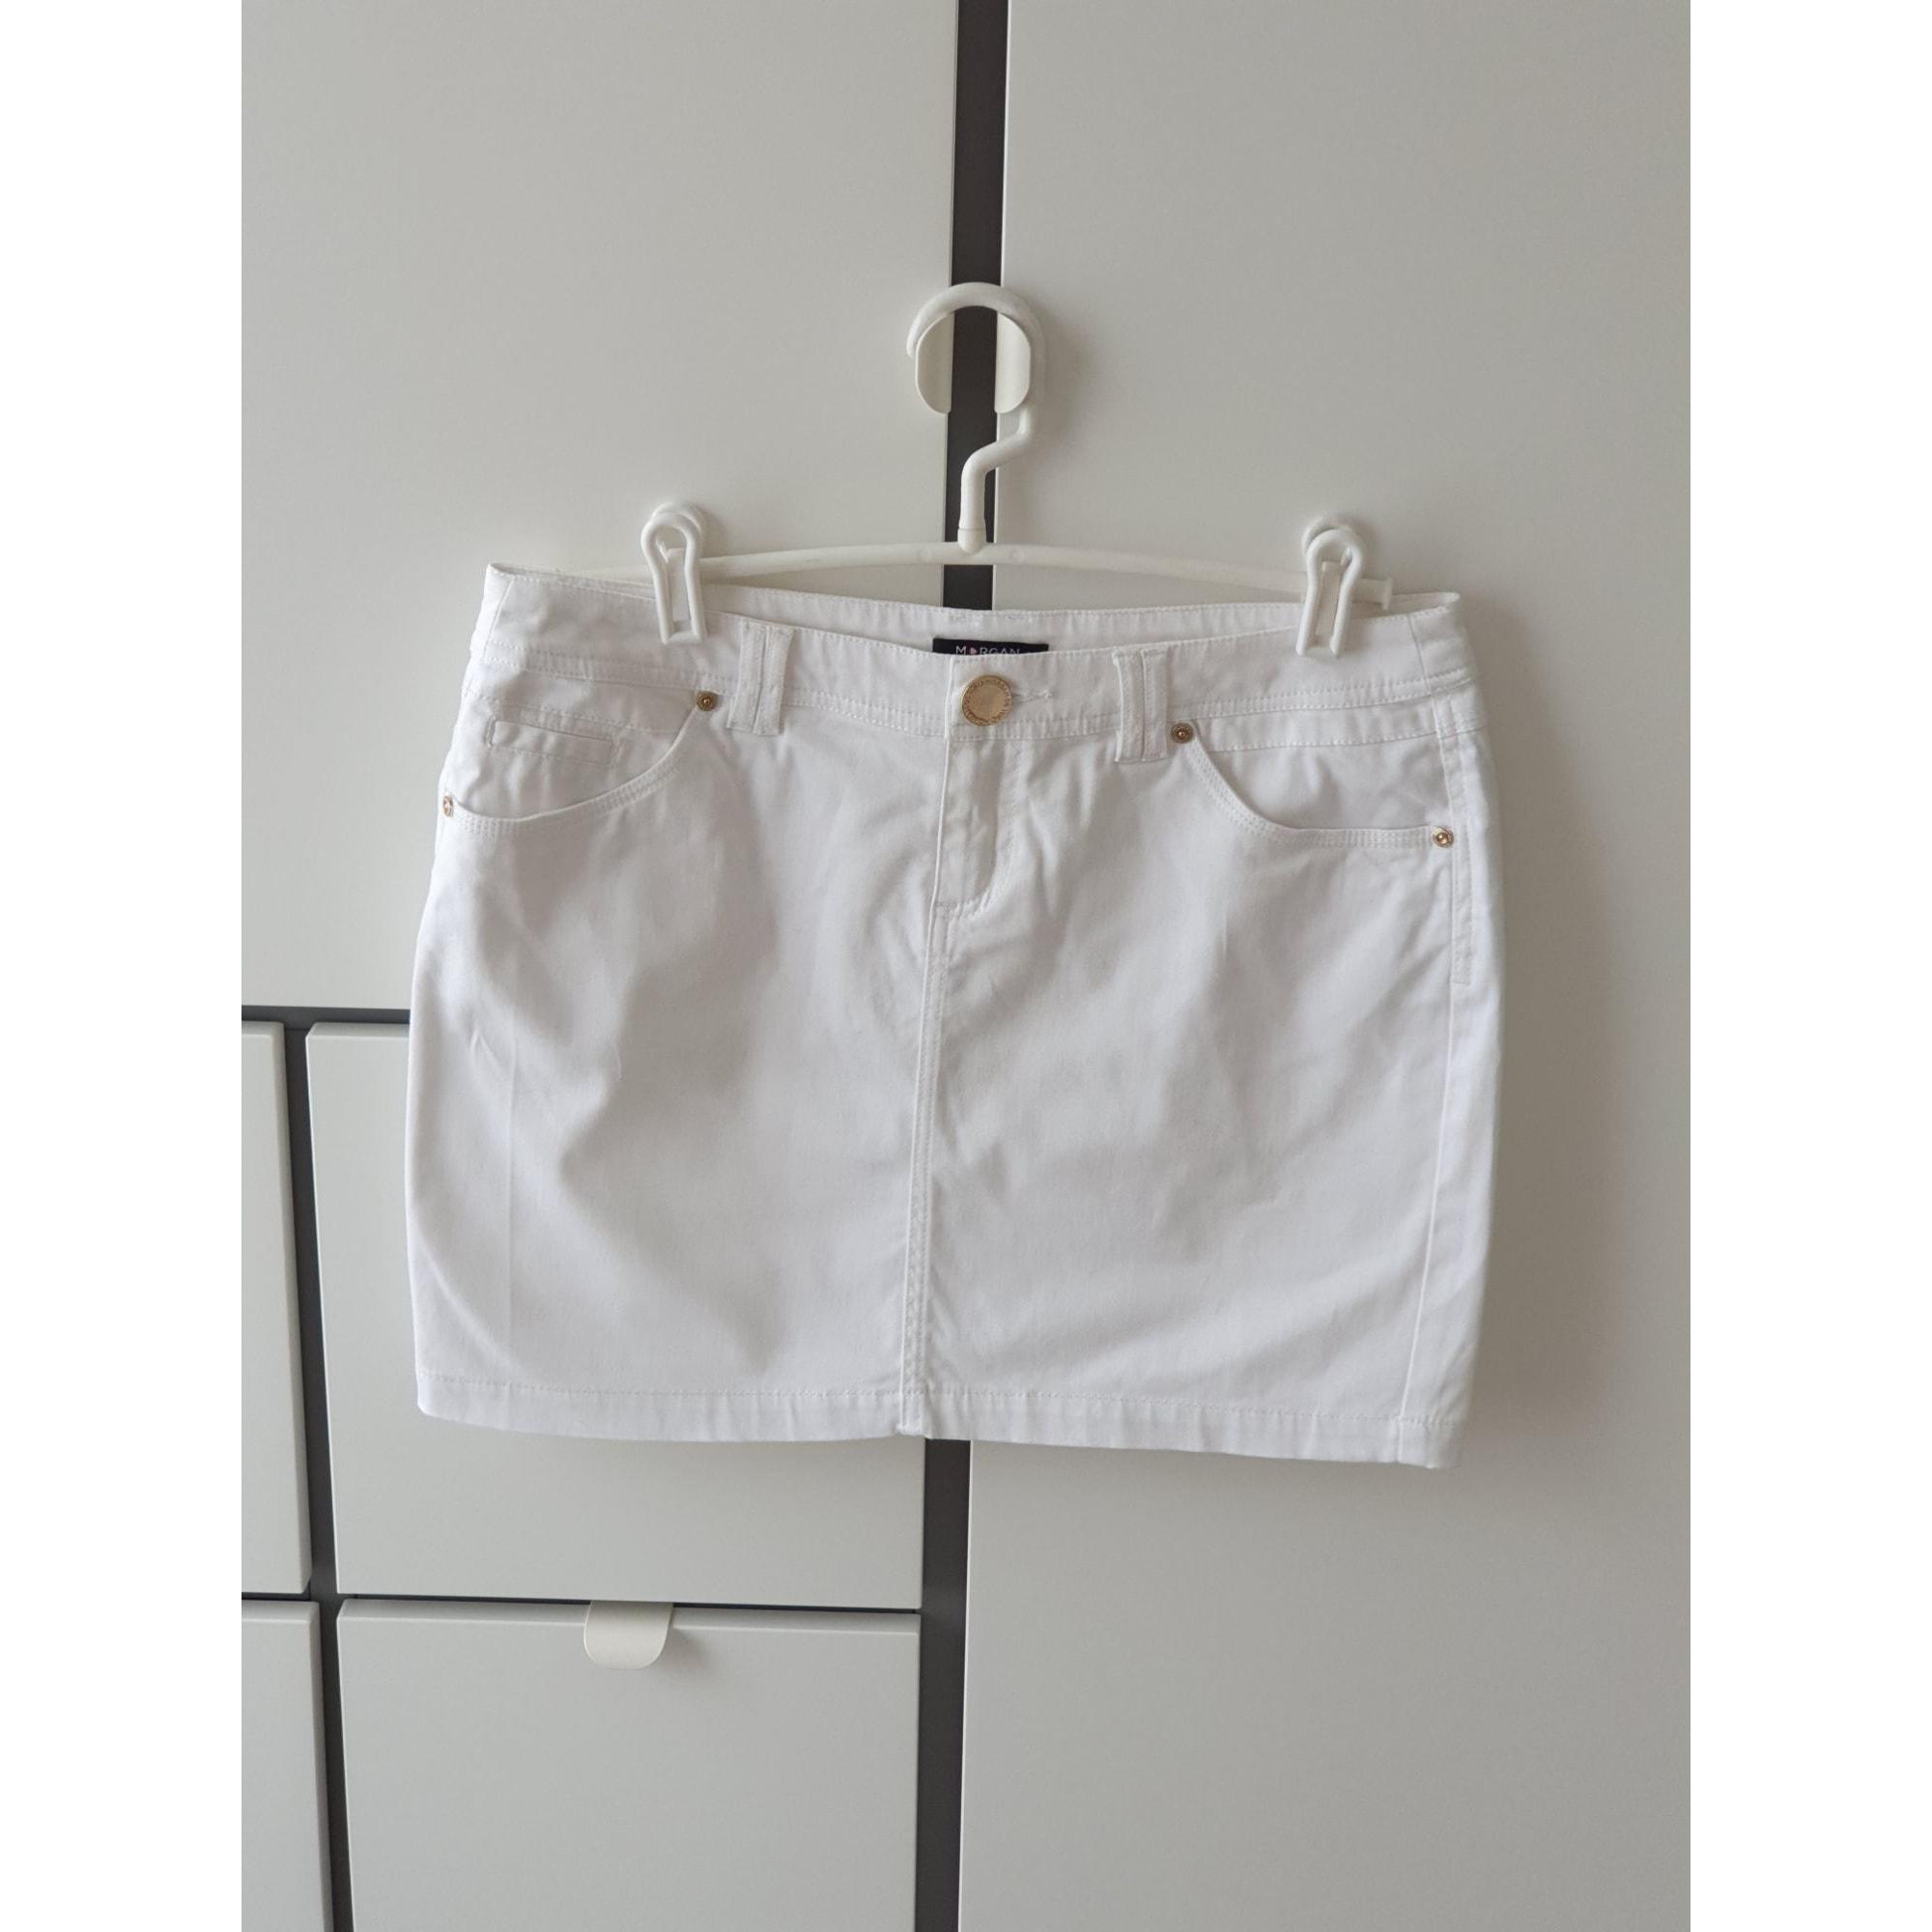 Jupe courte MORGAN Blanc, blanc cassé, écru